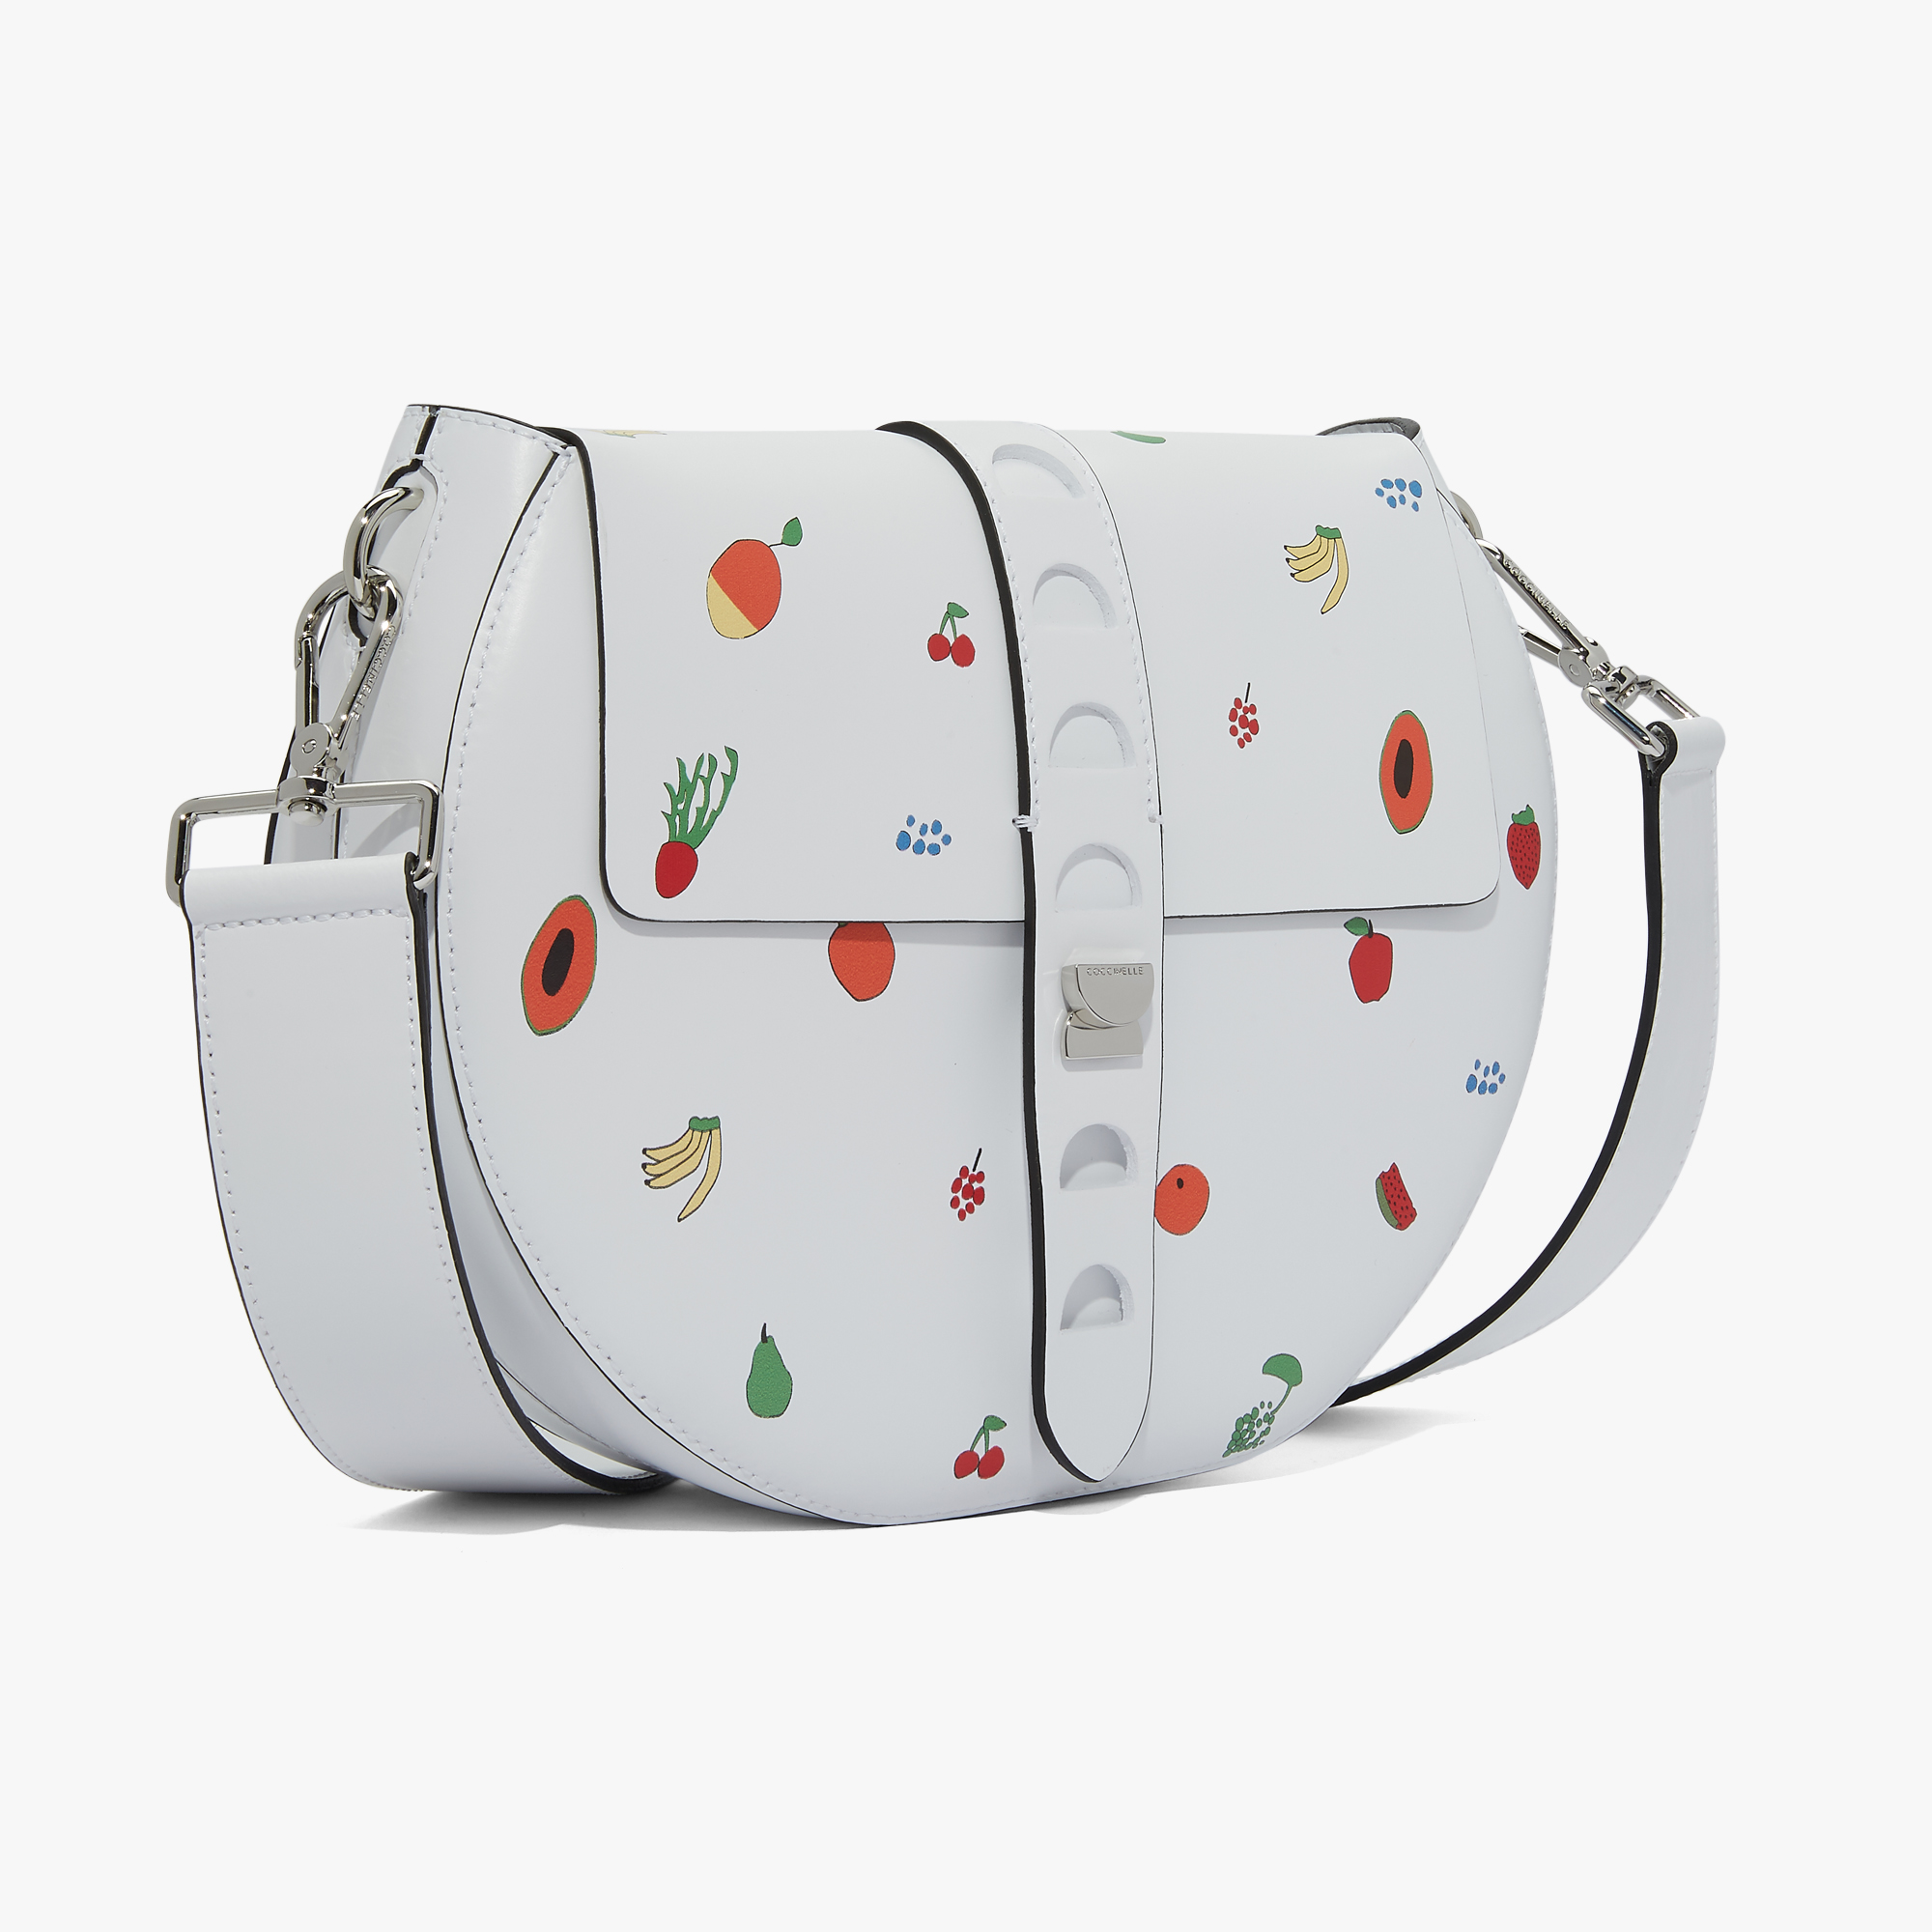 Carousel printed calfskin bag with single shoulder strap